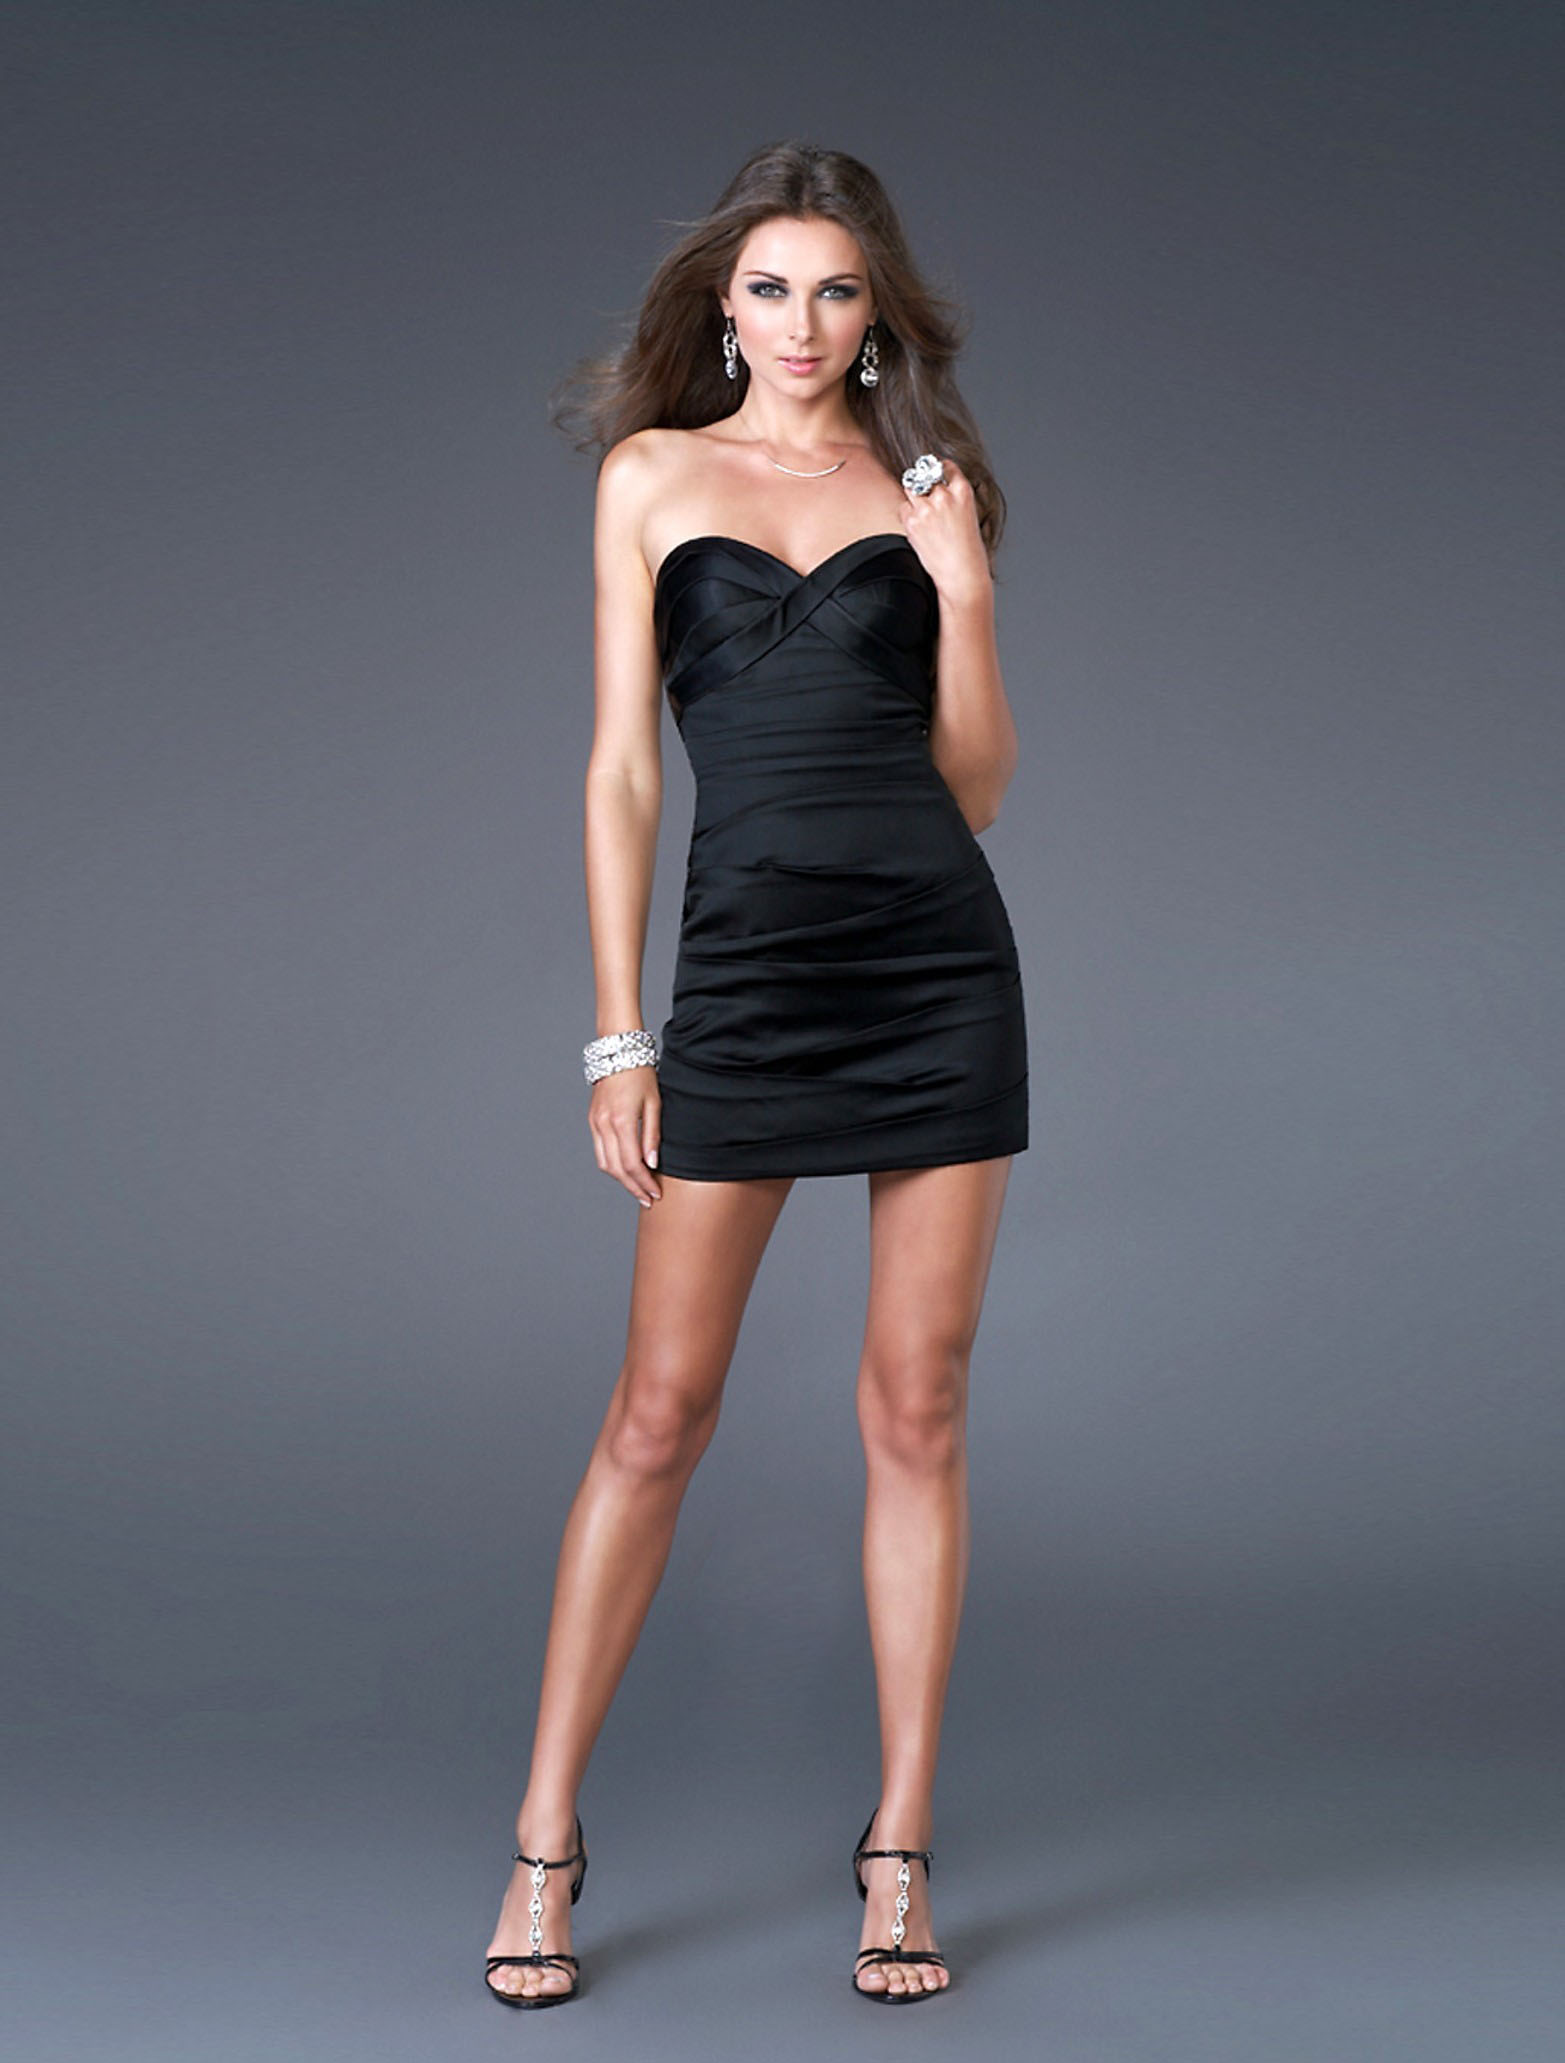 Petite Small Dresses & Make You Look Like A Princess